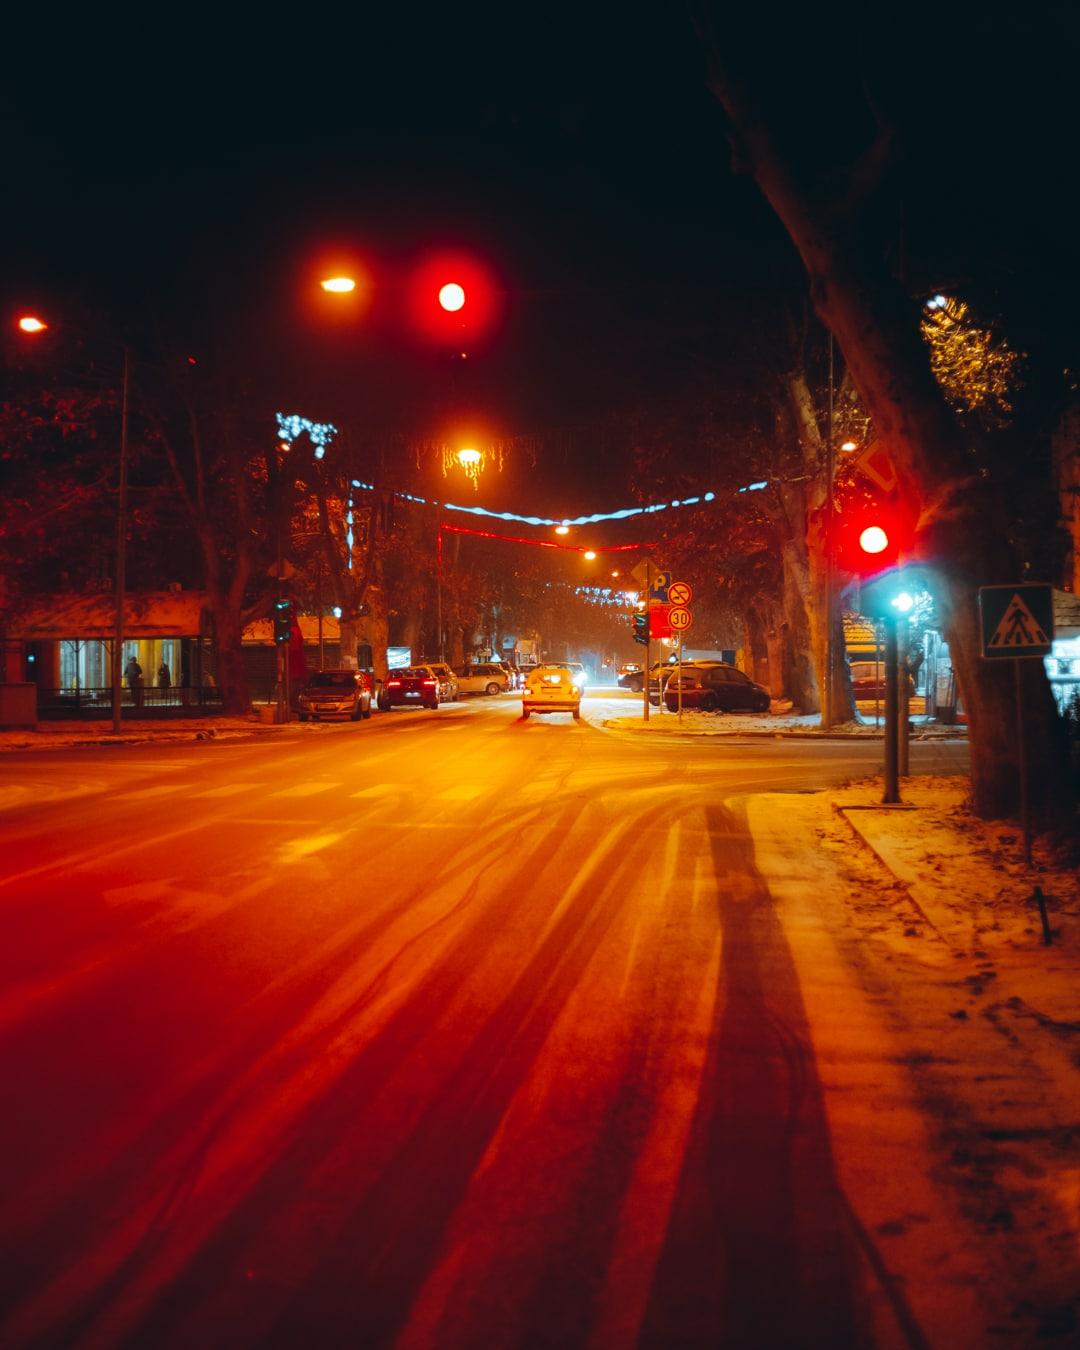 traffic control, traffic light, crossroads, semaphore, street, road, city, traffic, intersection, night